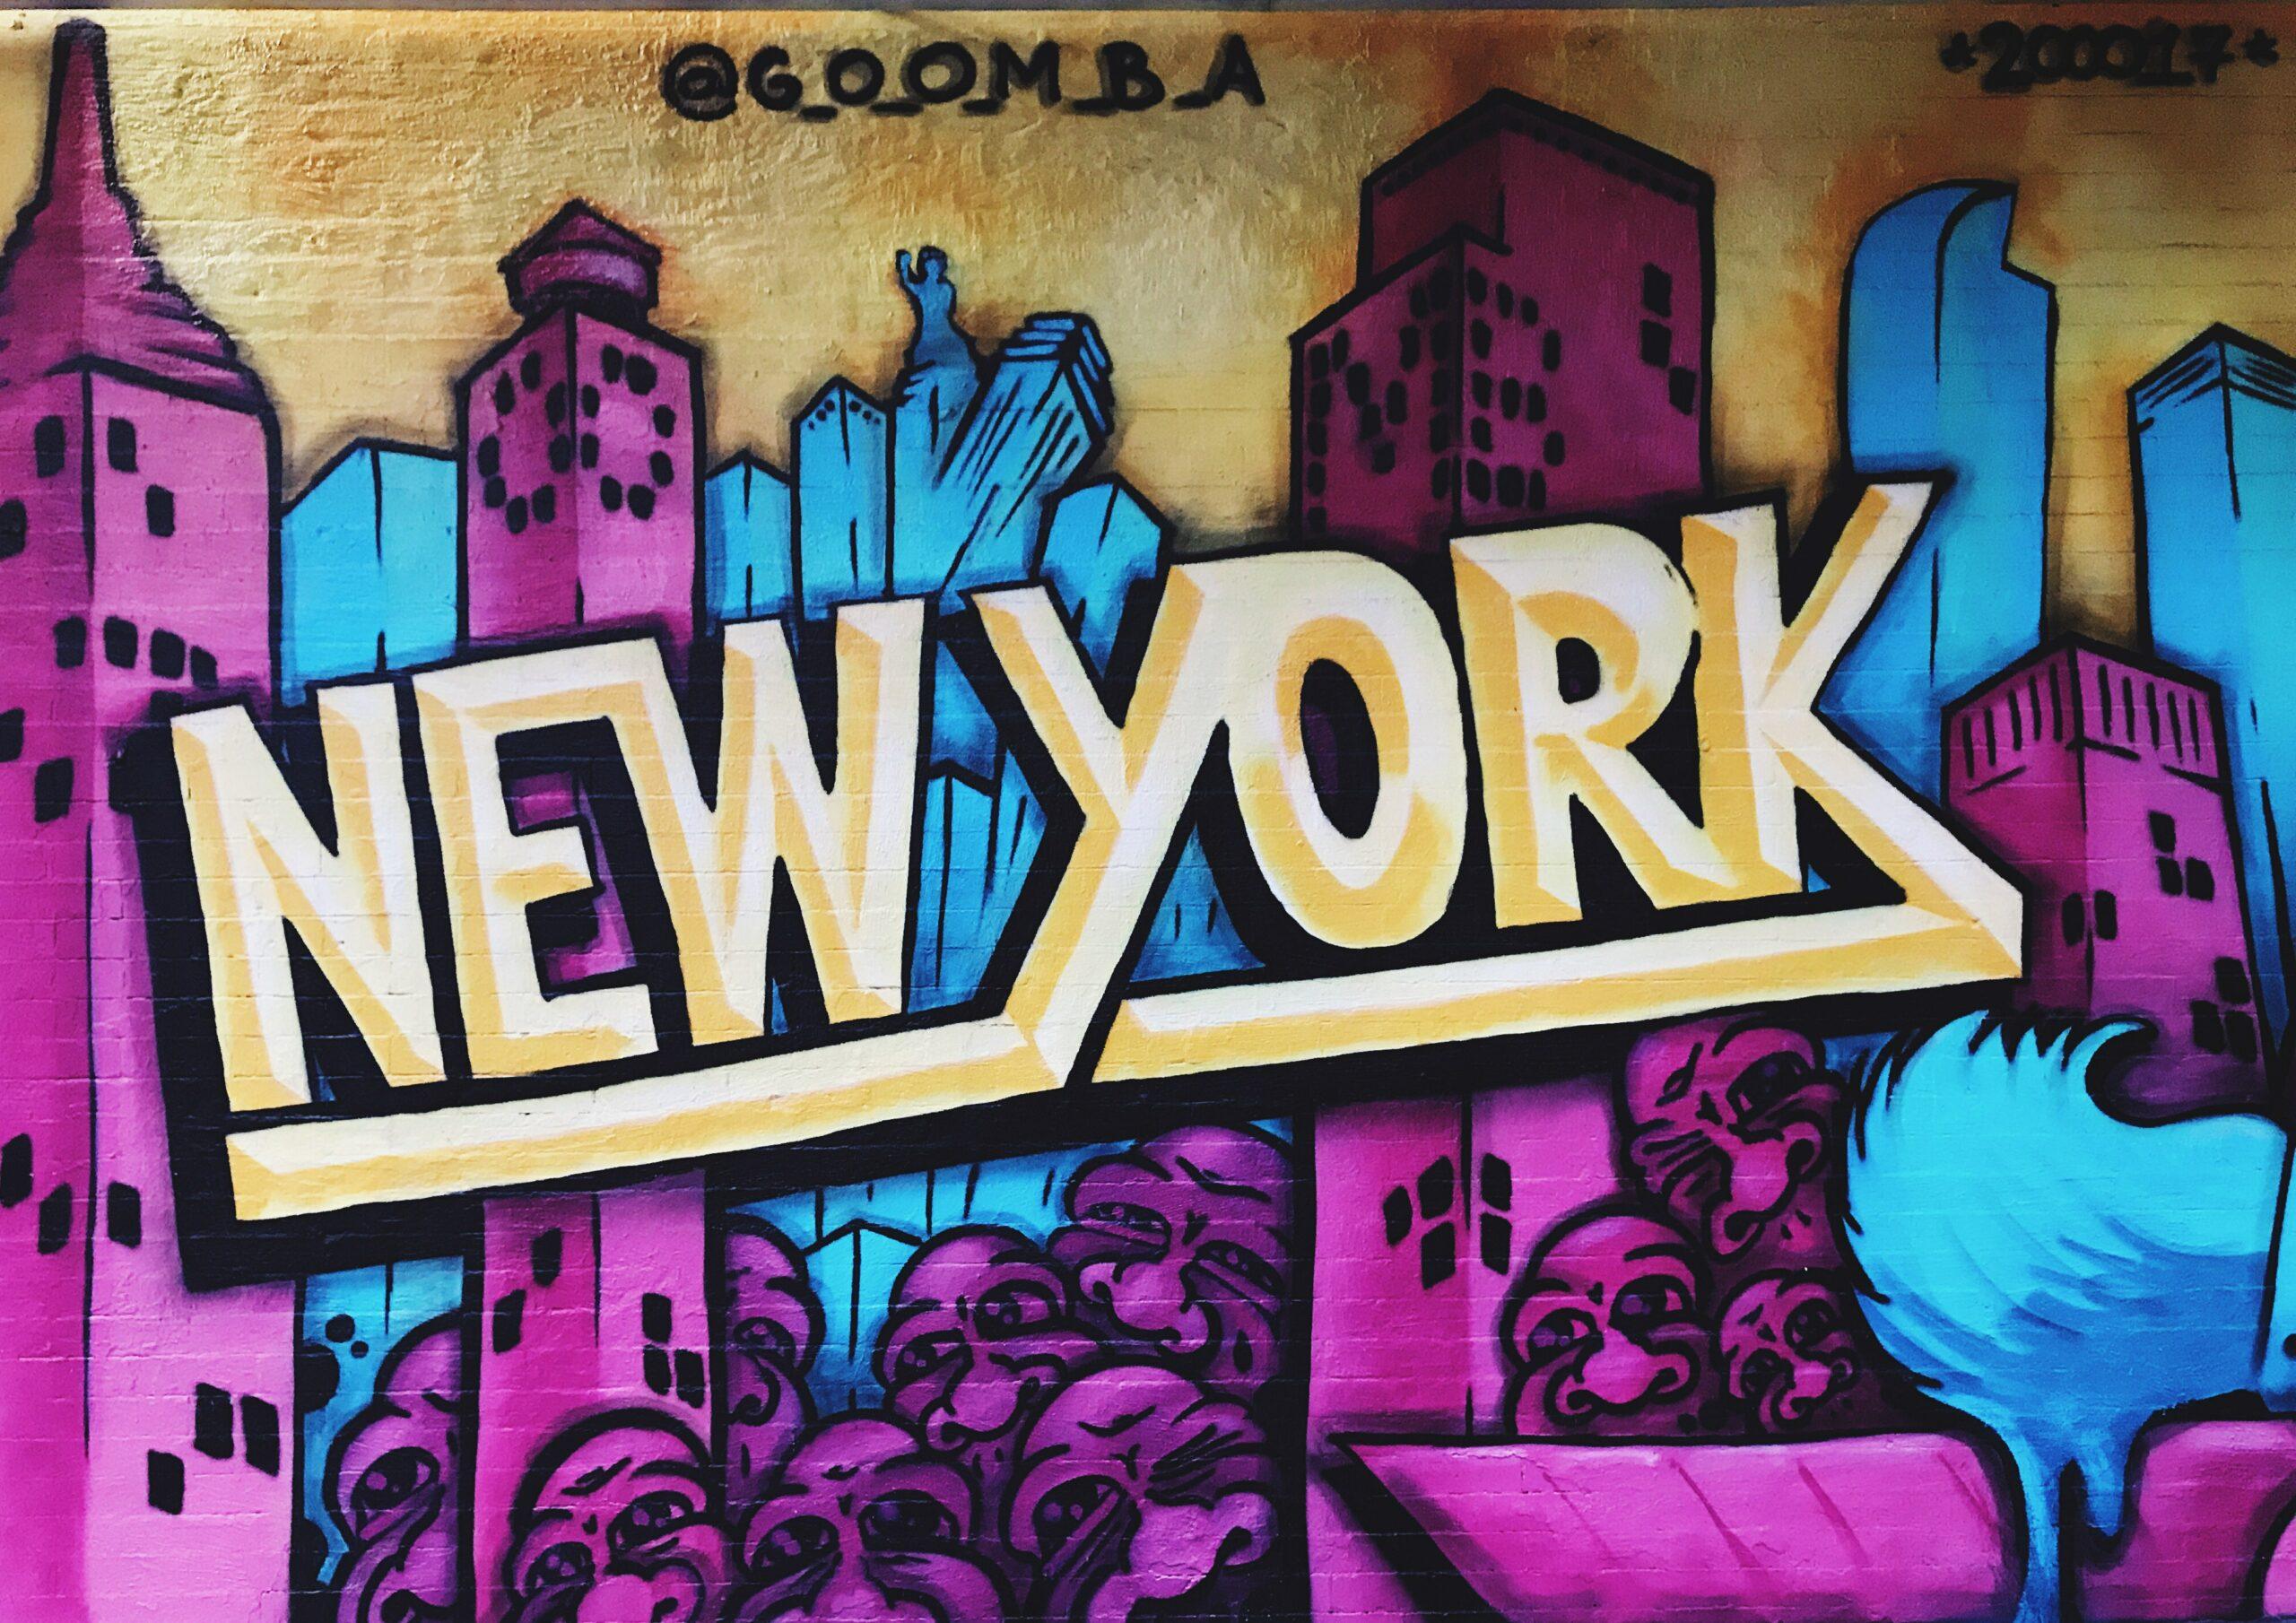 Recreational Cannabis in New York Brings Long-Awaited Medical Cannabis Expansion